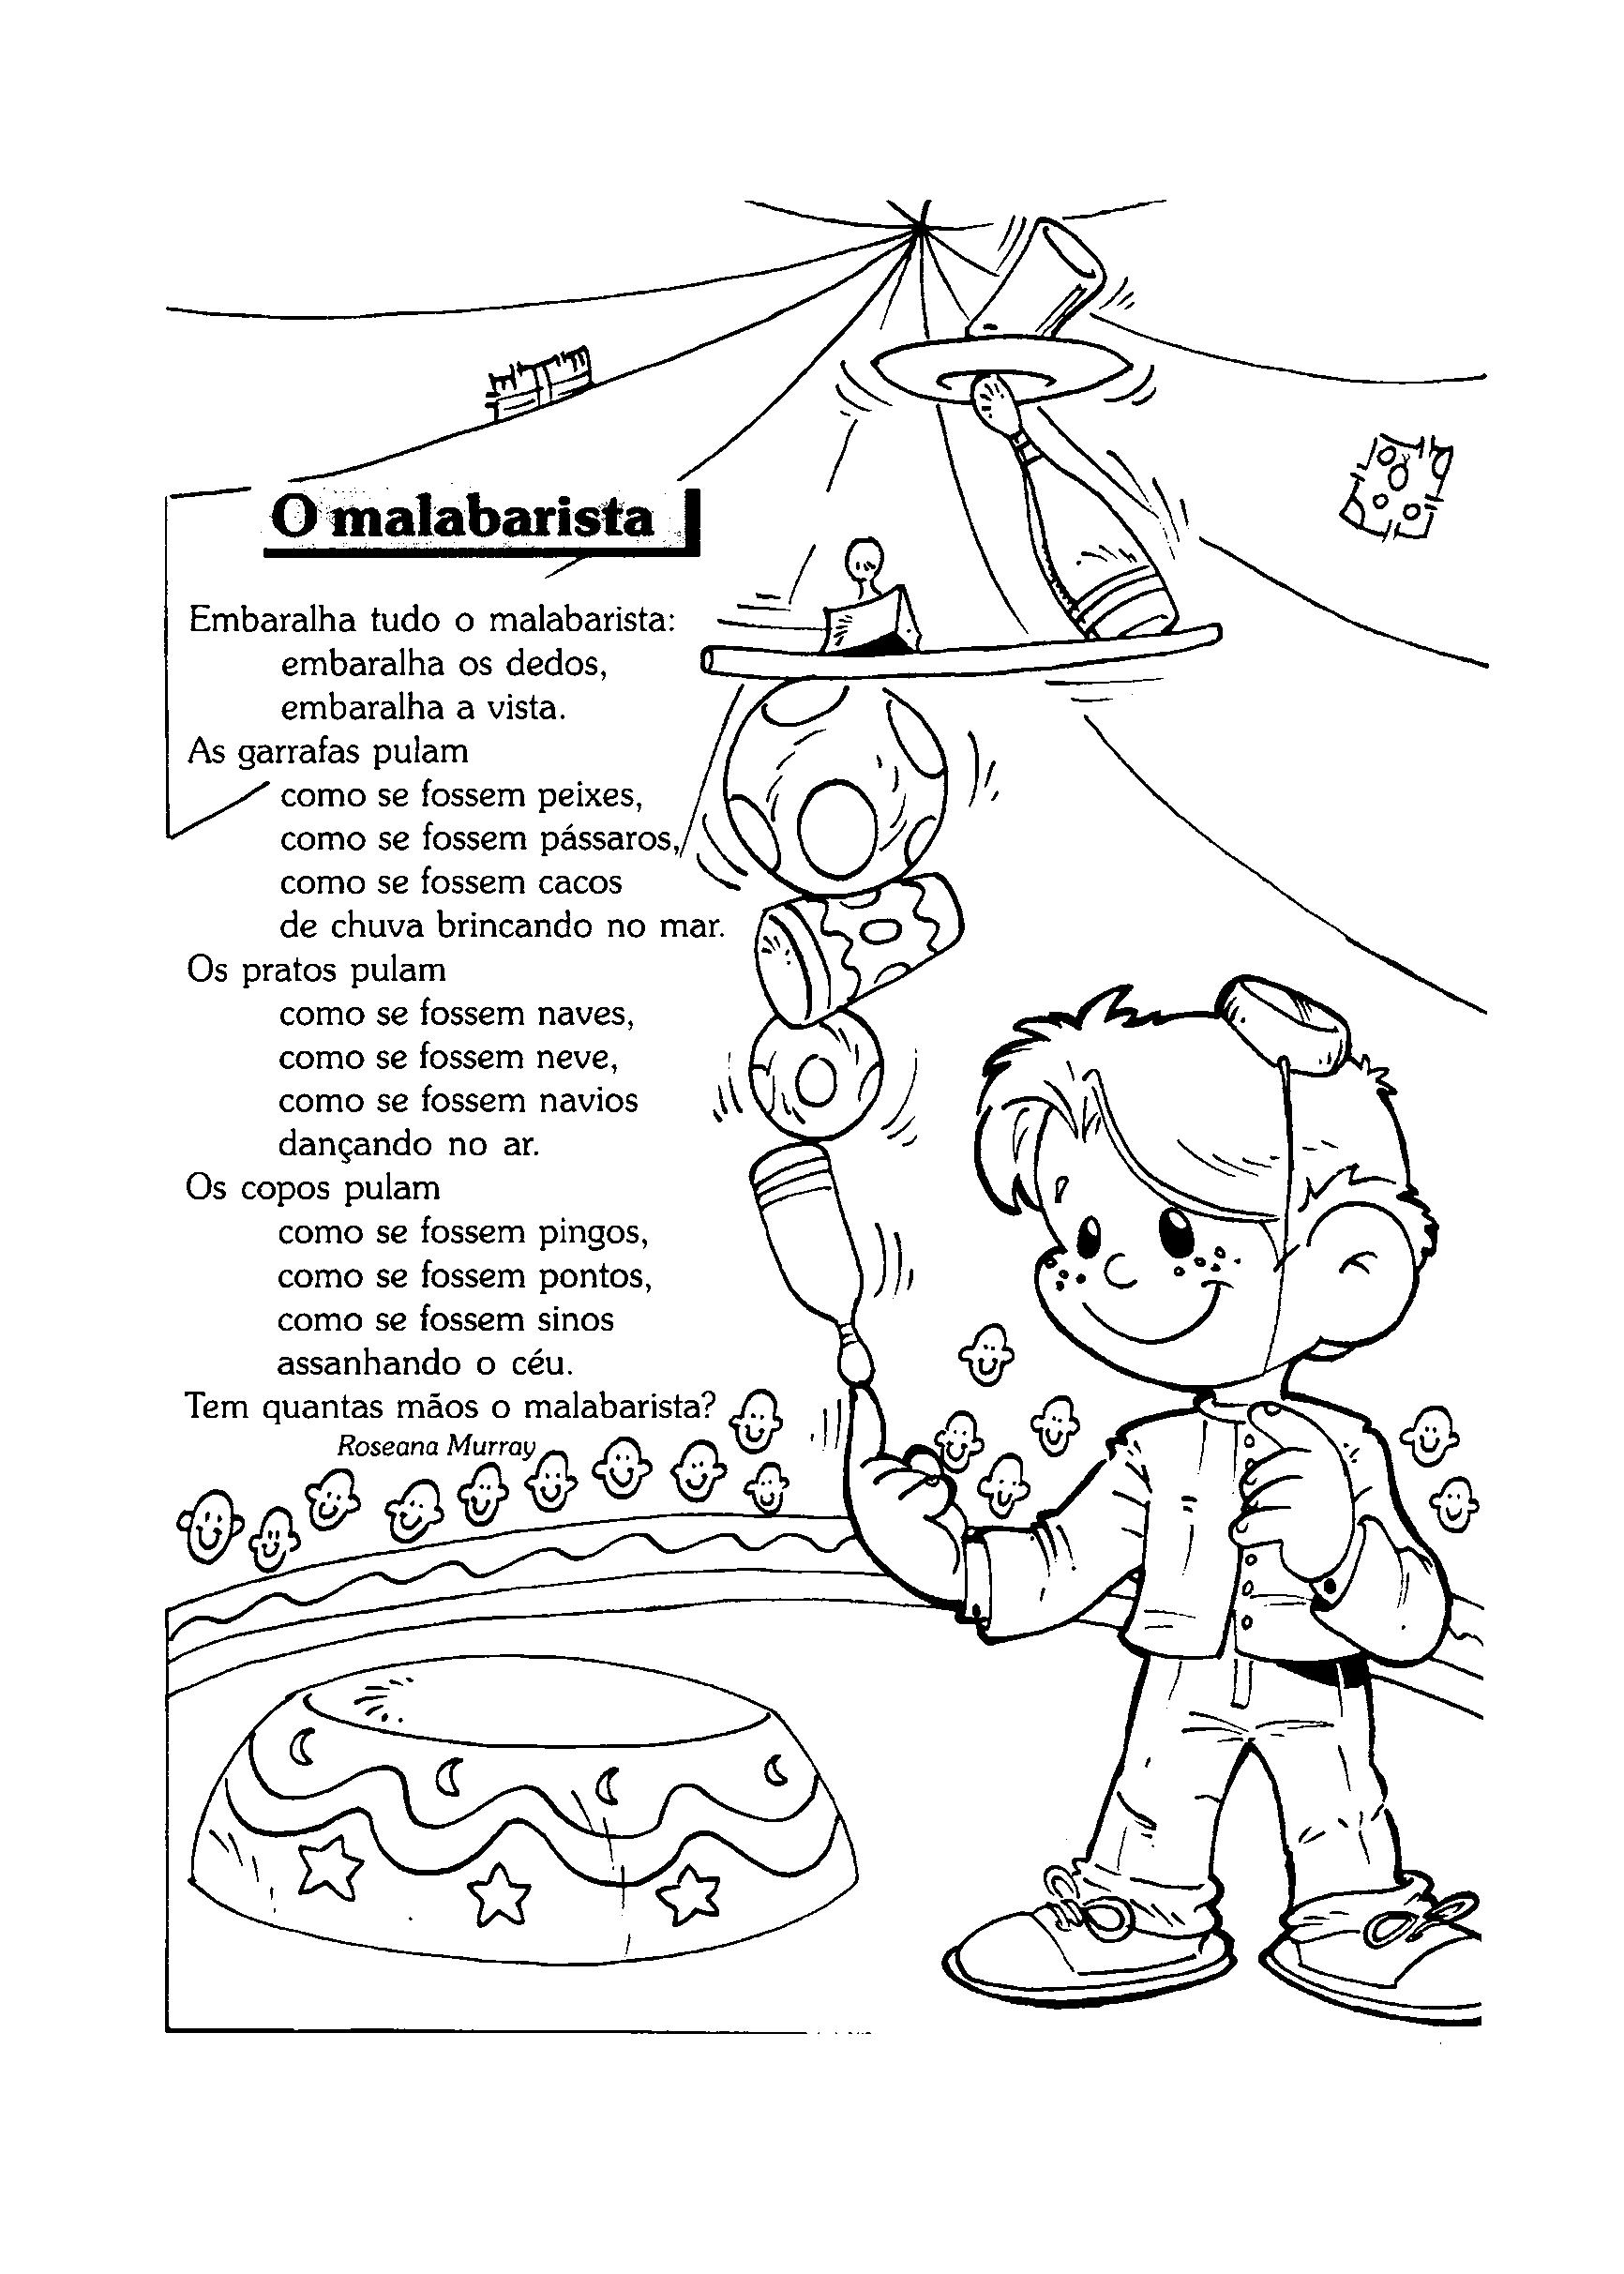 datas-marco-circo-poema-marabalista